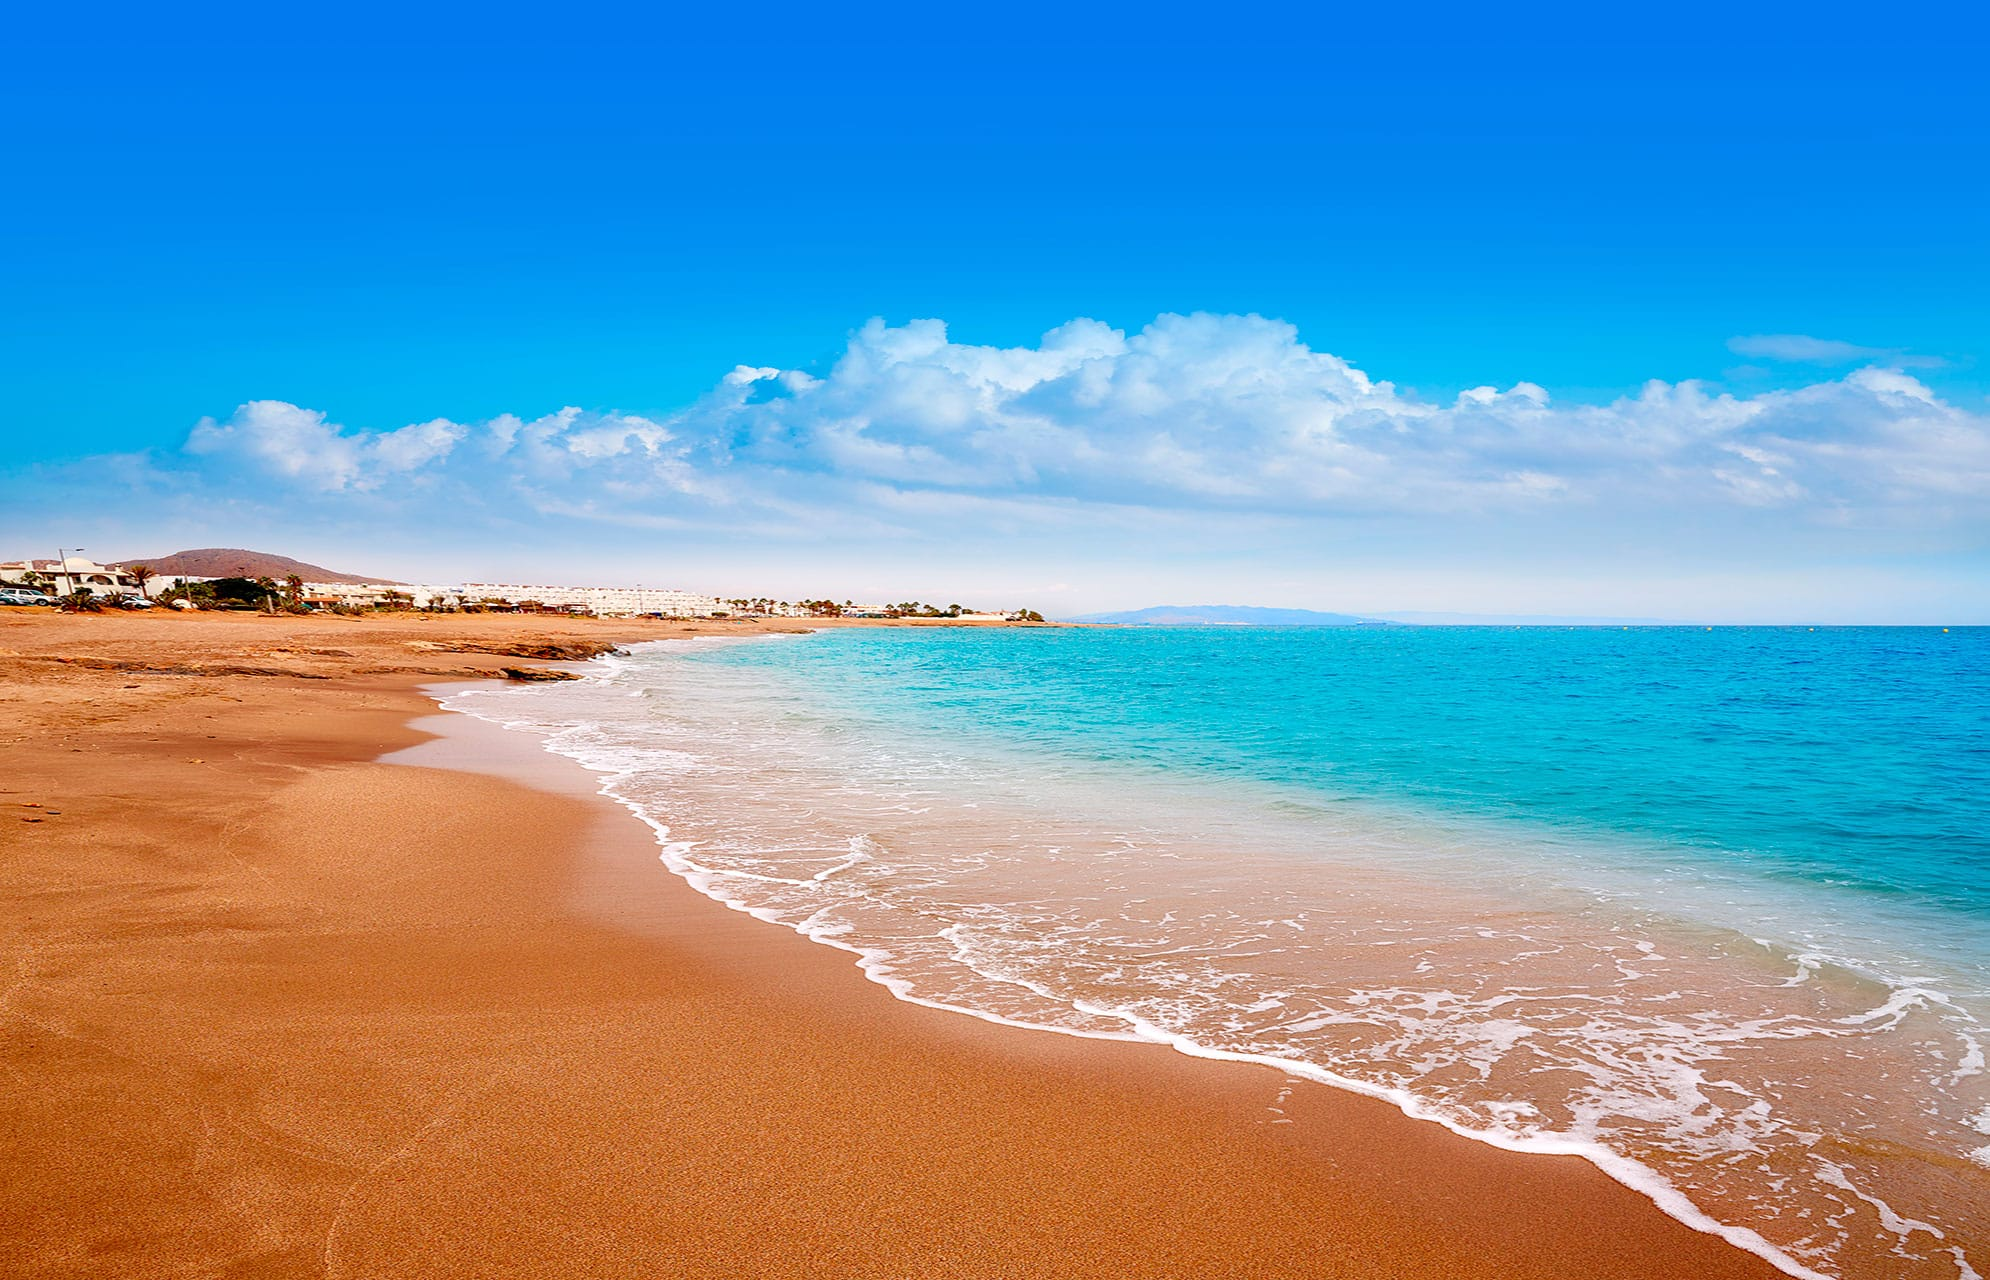 playa mojácar almería